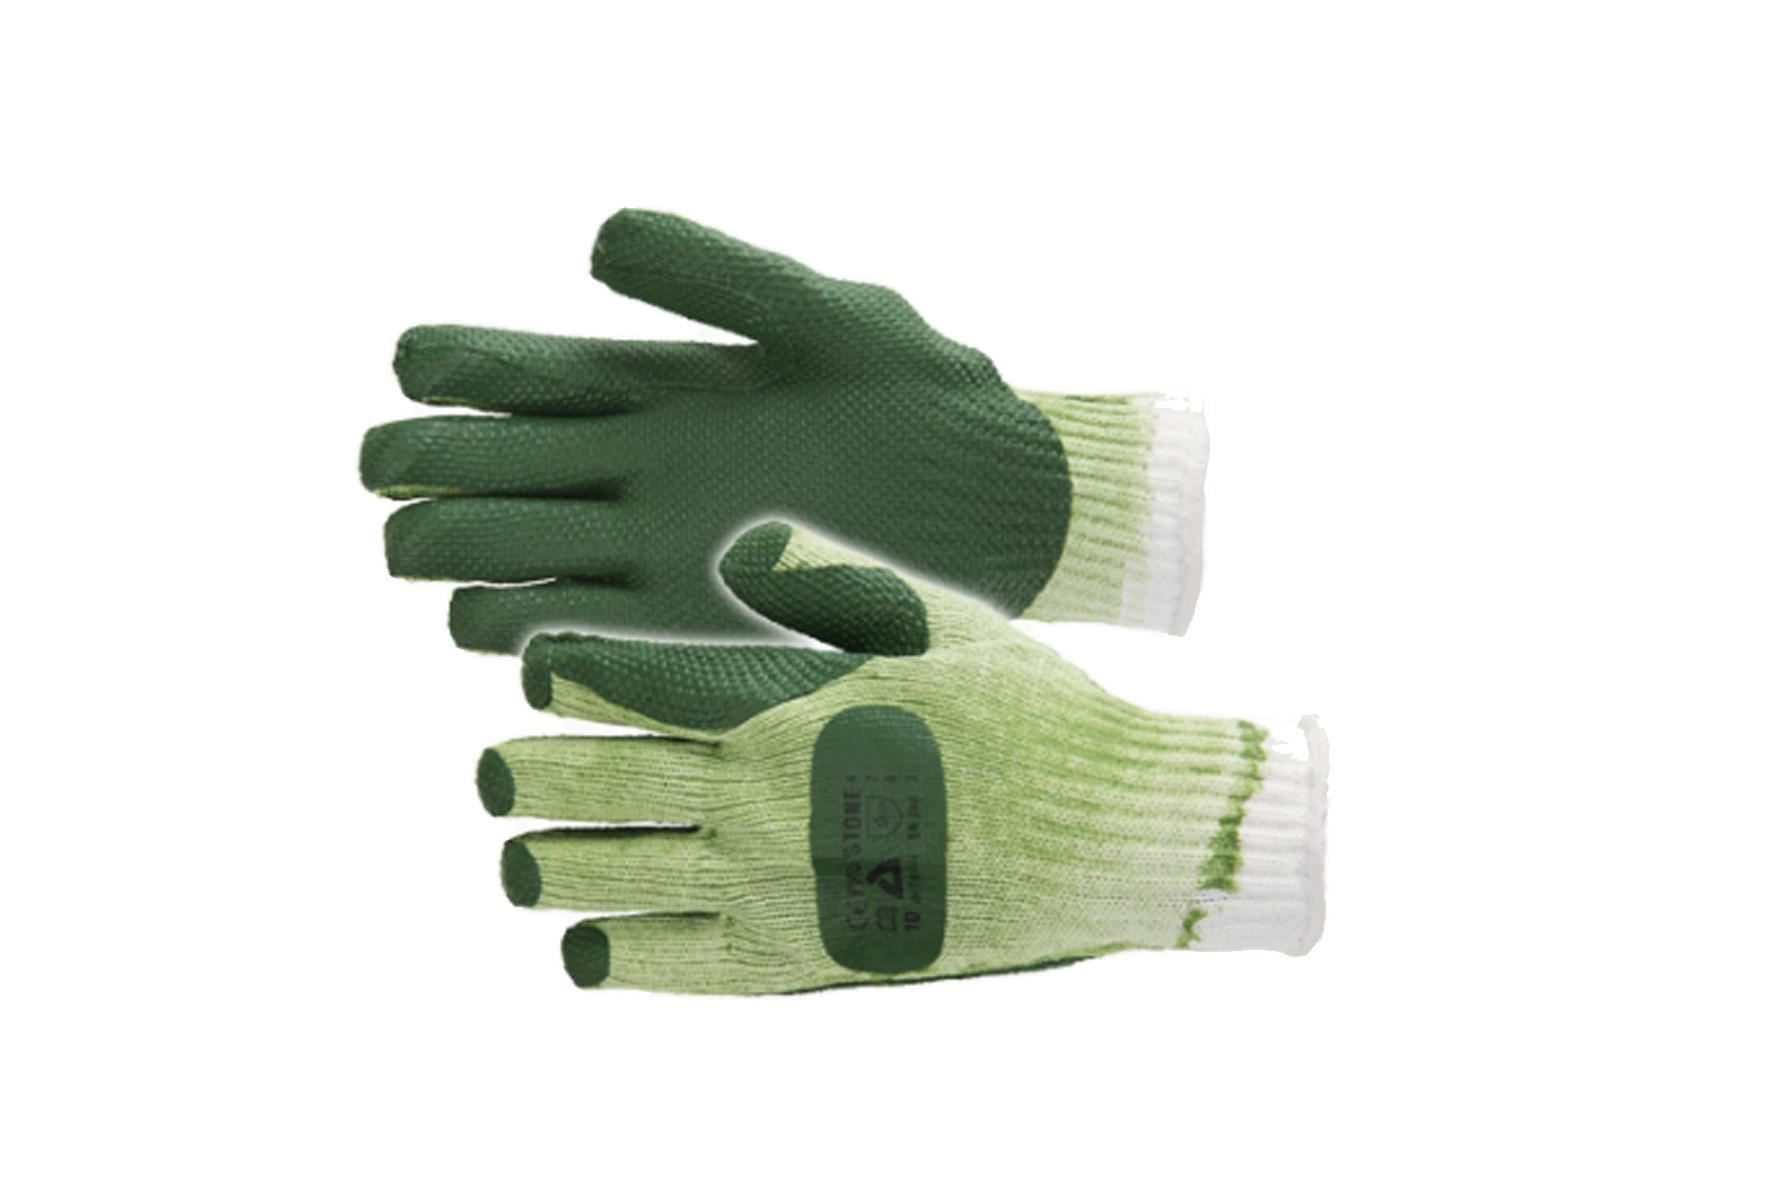 gants latex pro stone vert achat en ligne ou dans notre magasin. Black Bedroom Furniture Sets. Home Design Ideas